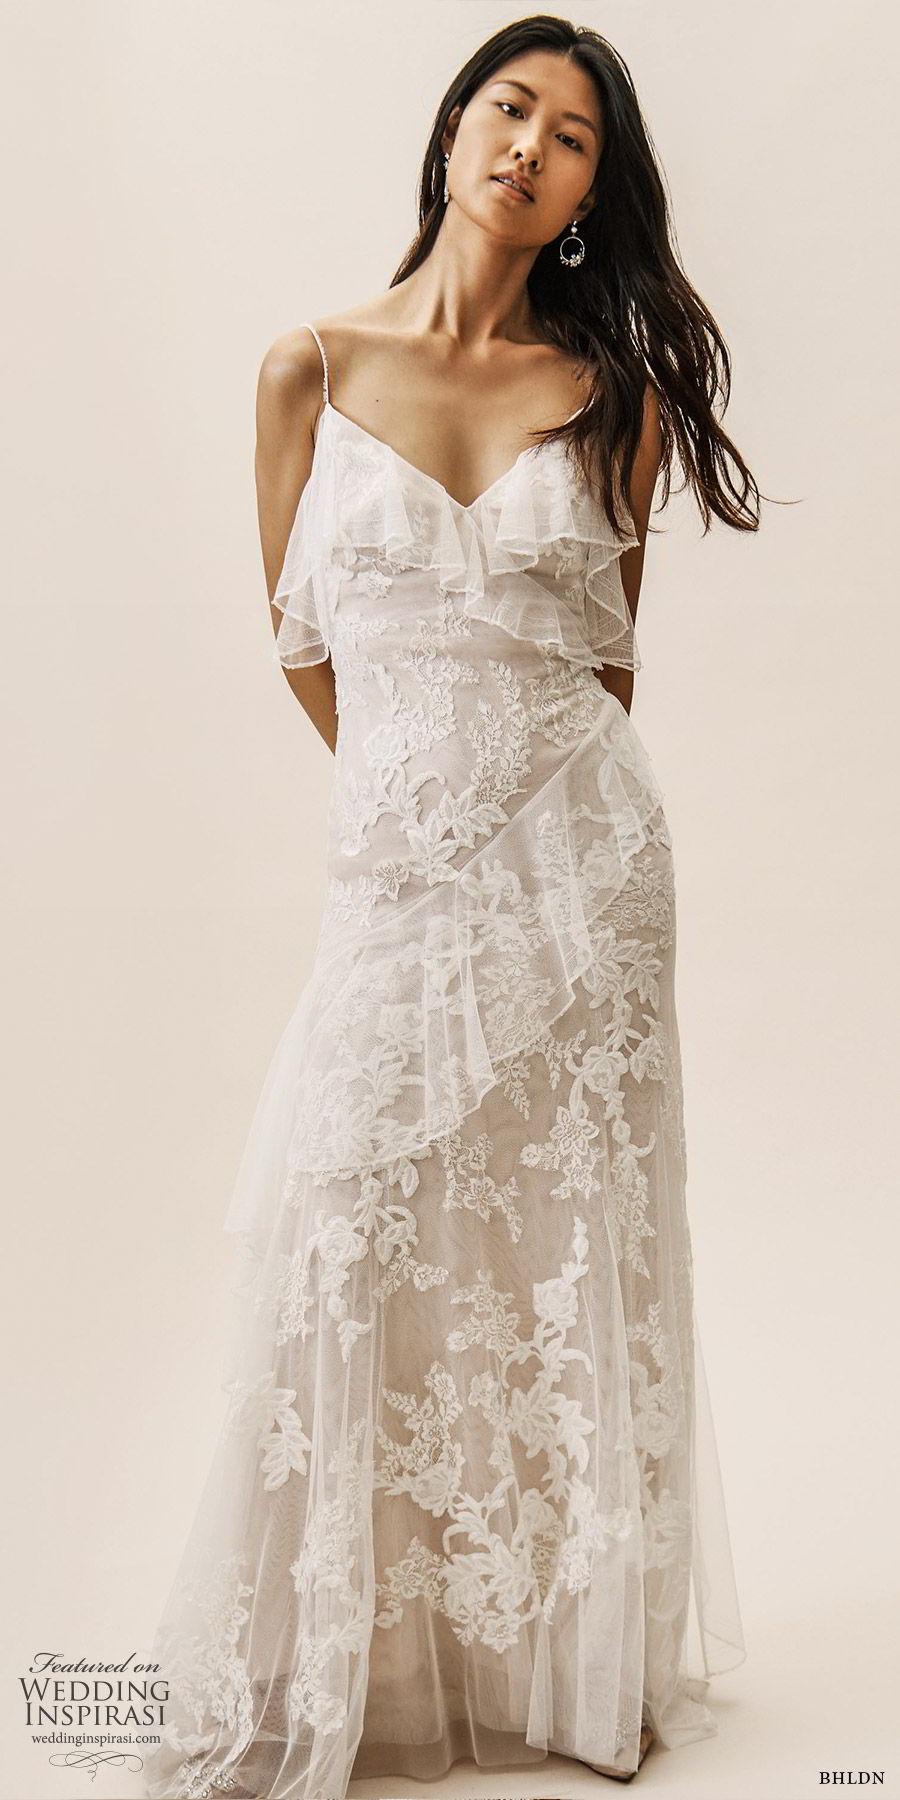 bhldn spring 2019 bridal sleeveless thin straps v neckline sheath lace wedding dress ruffle skirt low back chapel train romantic (11) mv